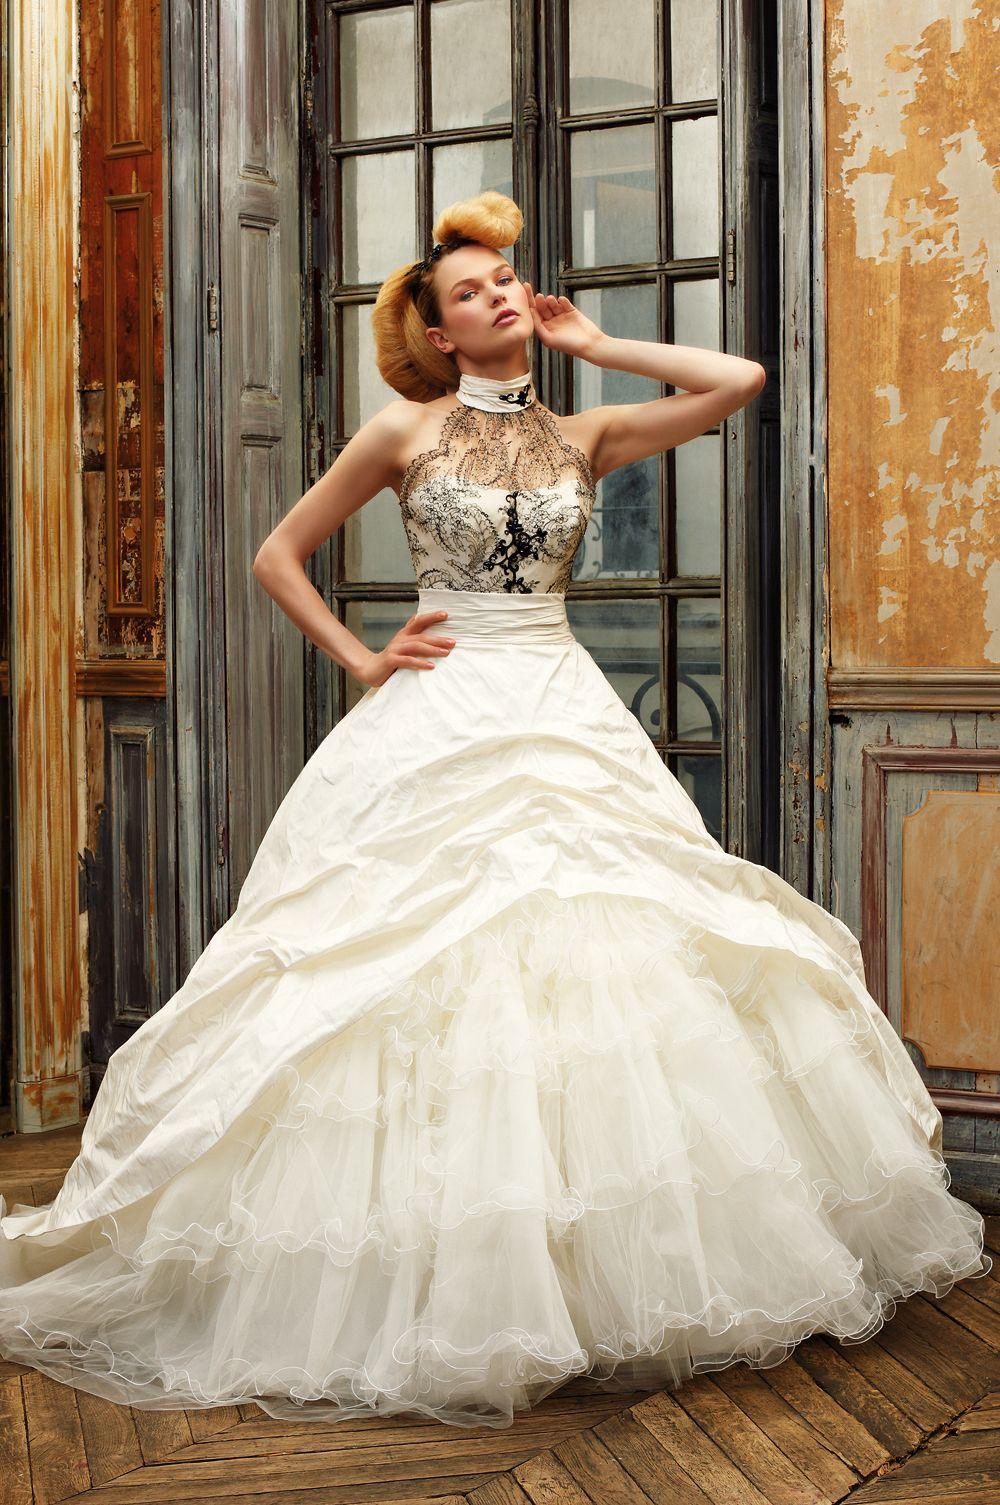 black lace wedding dress Eli Shay Wedding Dress Collections Comedy Ecru Black Dress Calais lace bodice